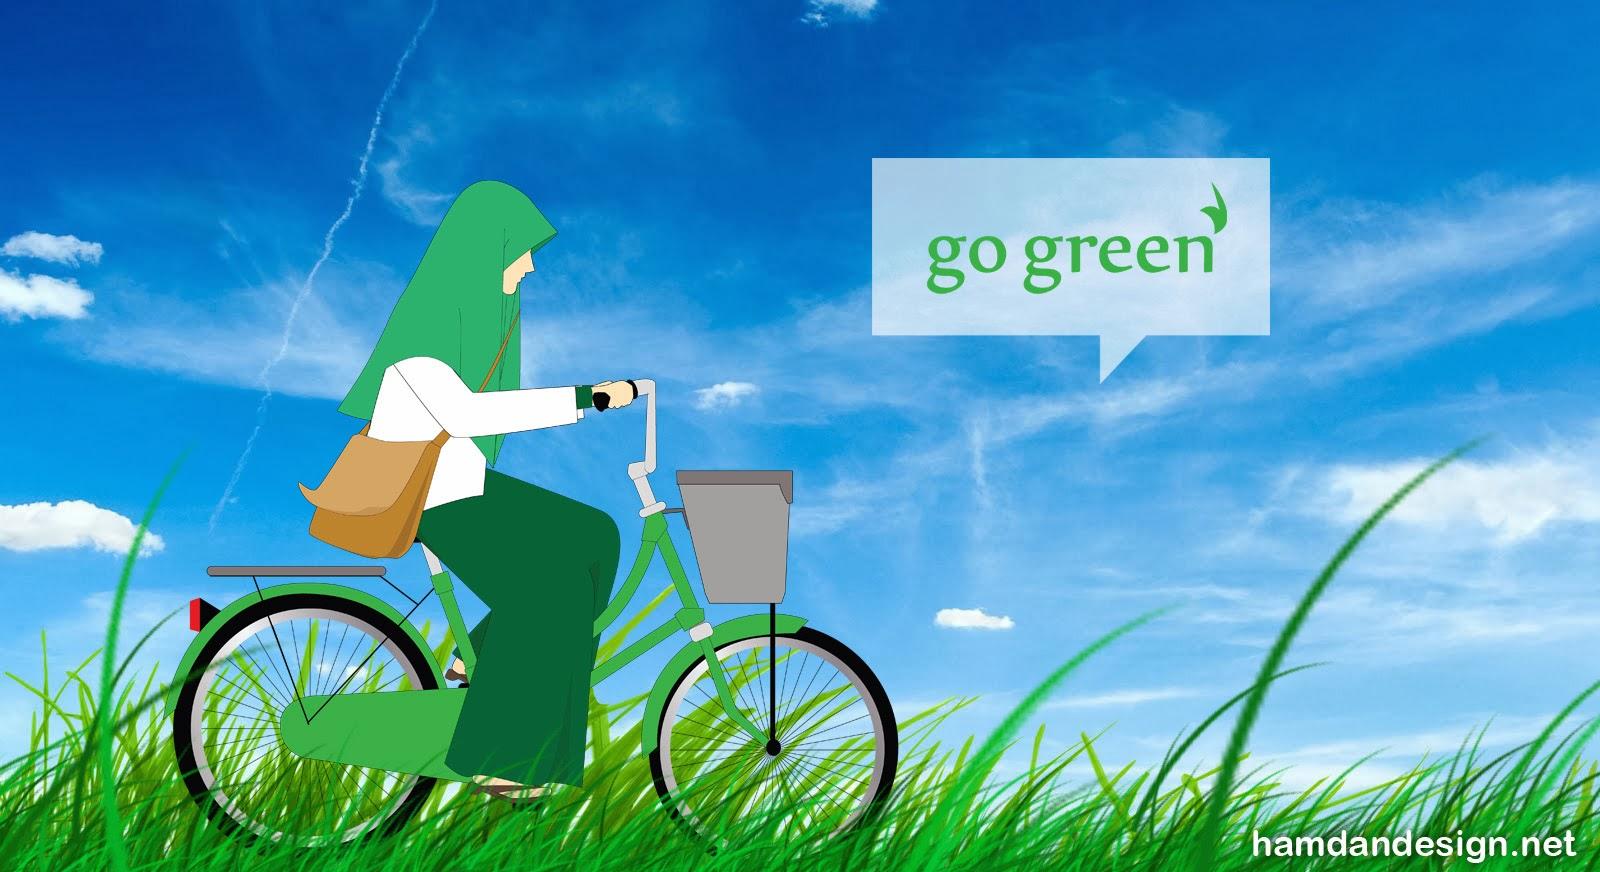 Kartun Akhwat Muslimah Bersepeda Go Green Kartun